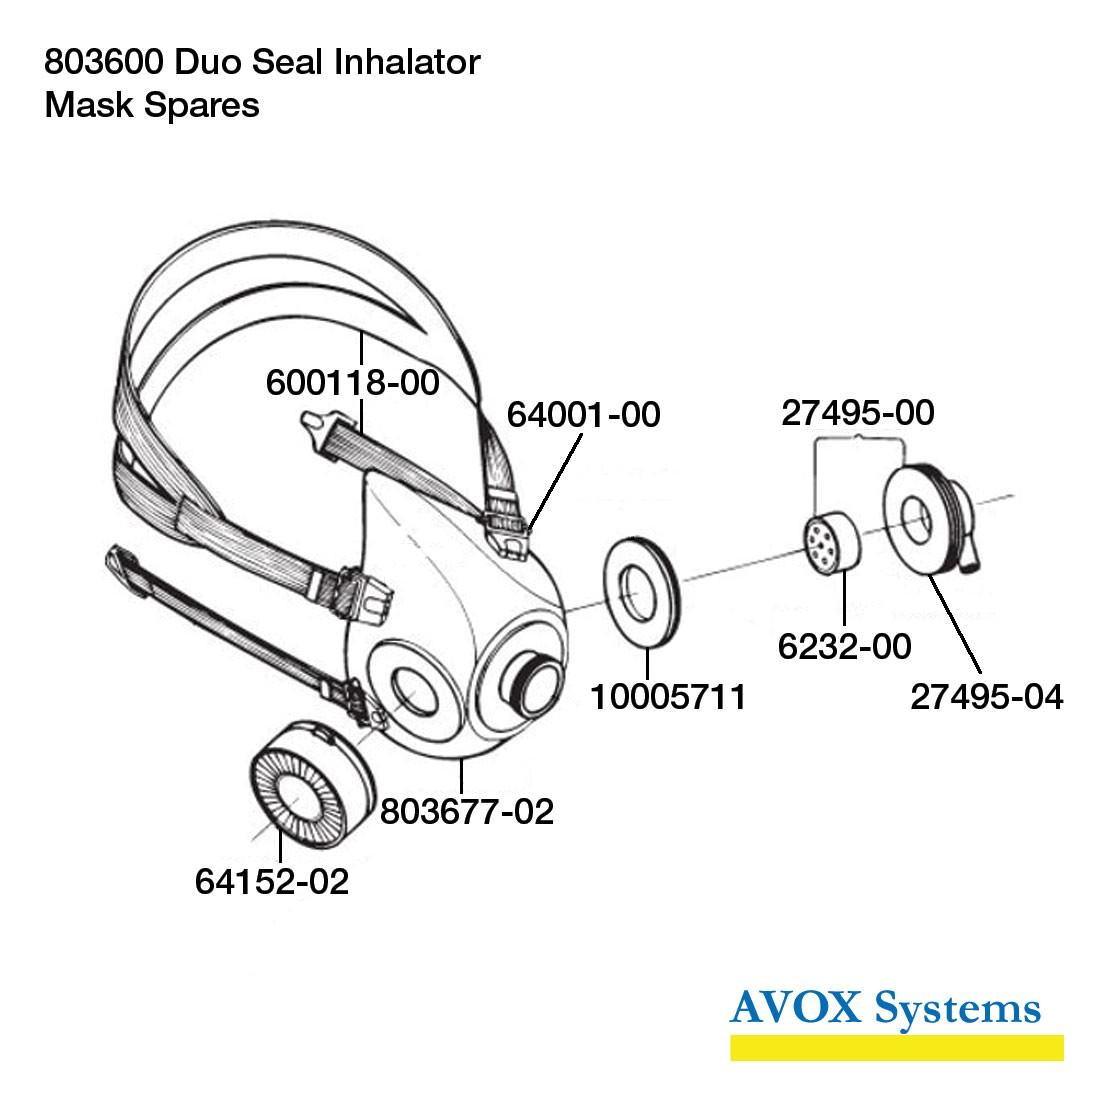 803600 Duo Seal Inhalator Mask - Spares